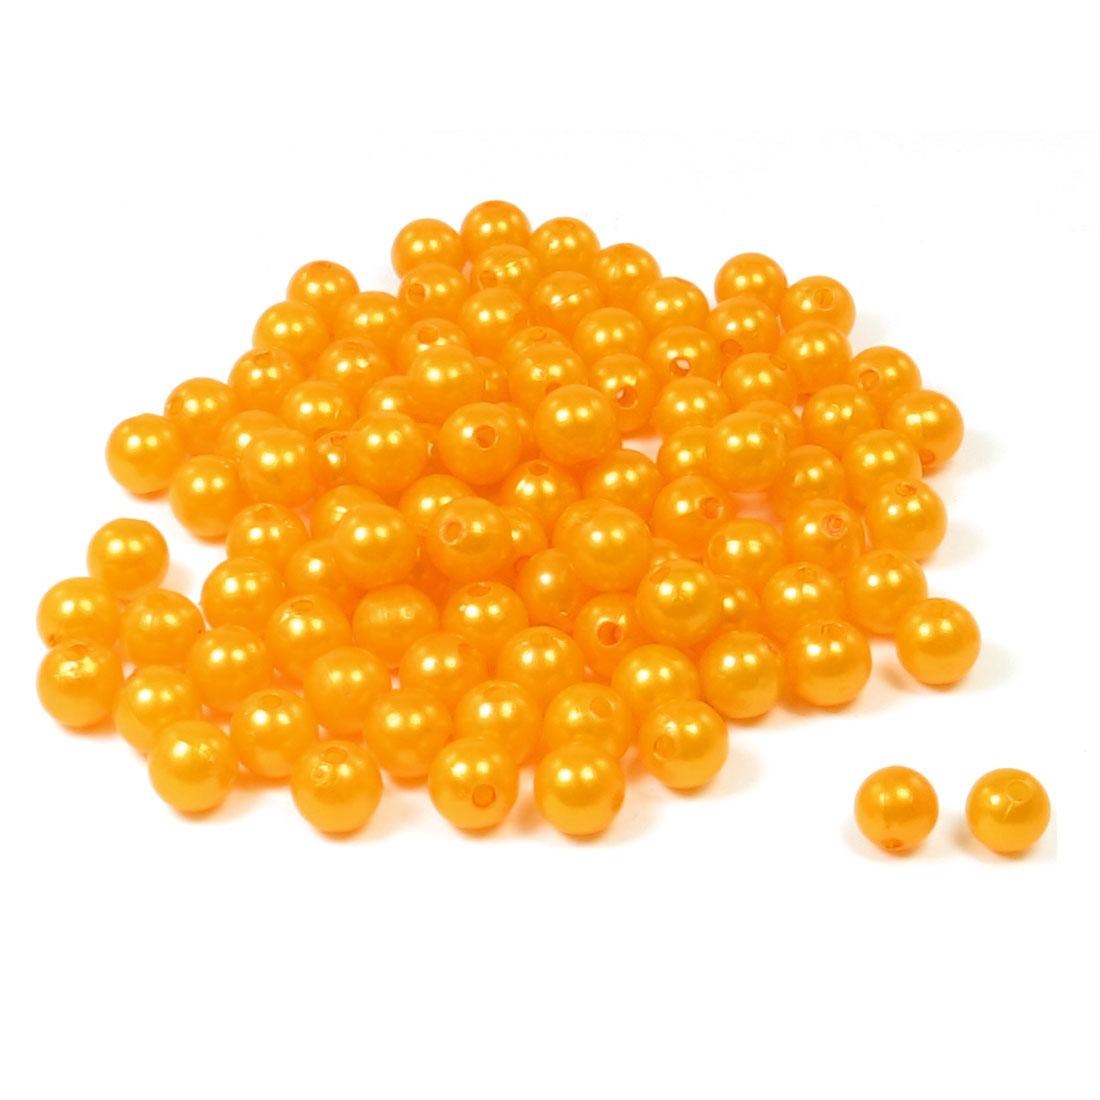 DIY Necklace Jewelry Orange Plastic Beads 100 Pieces